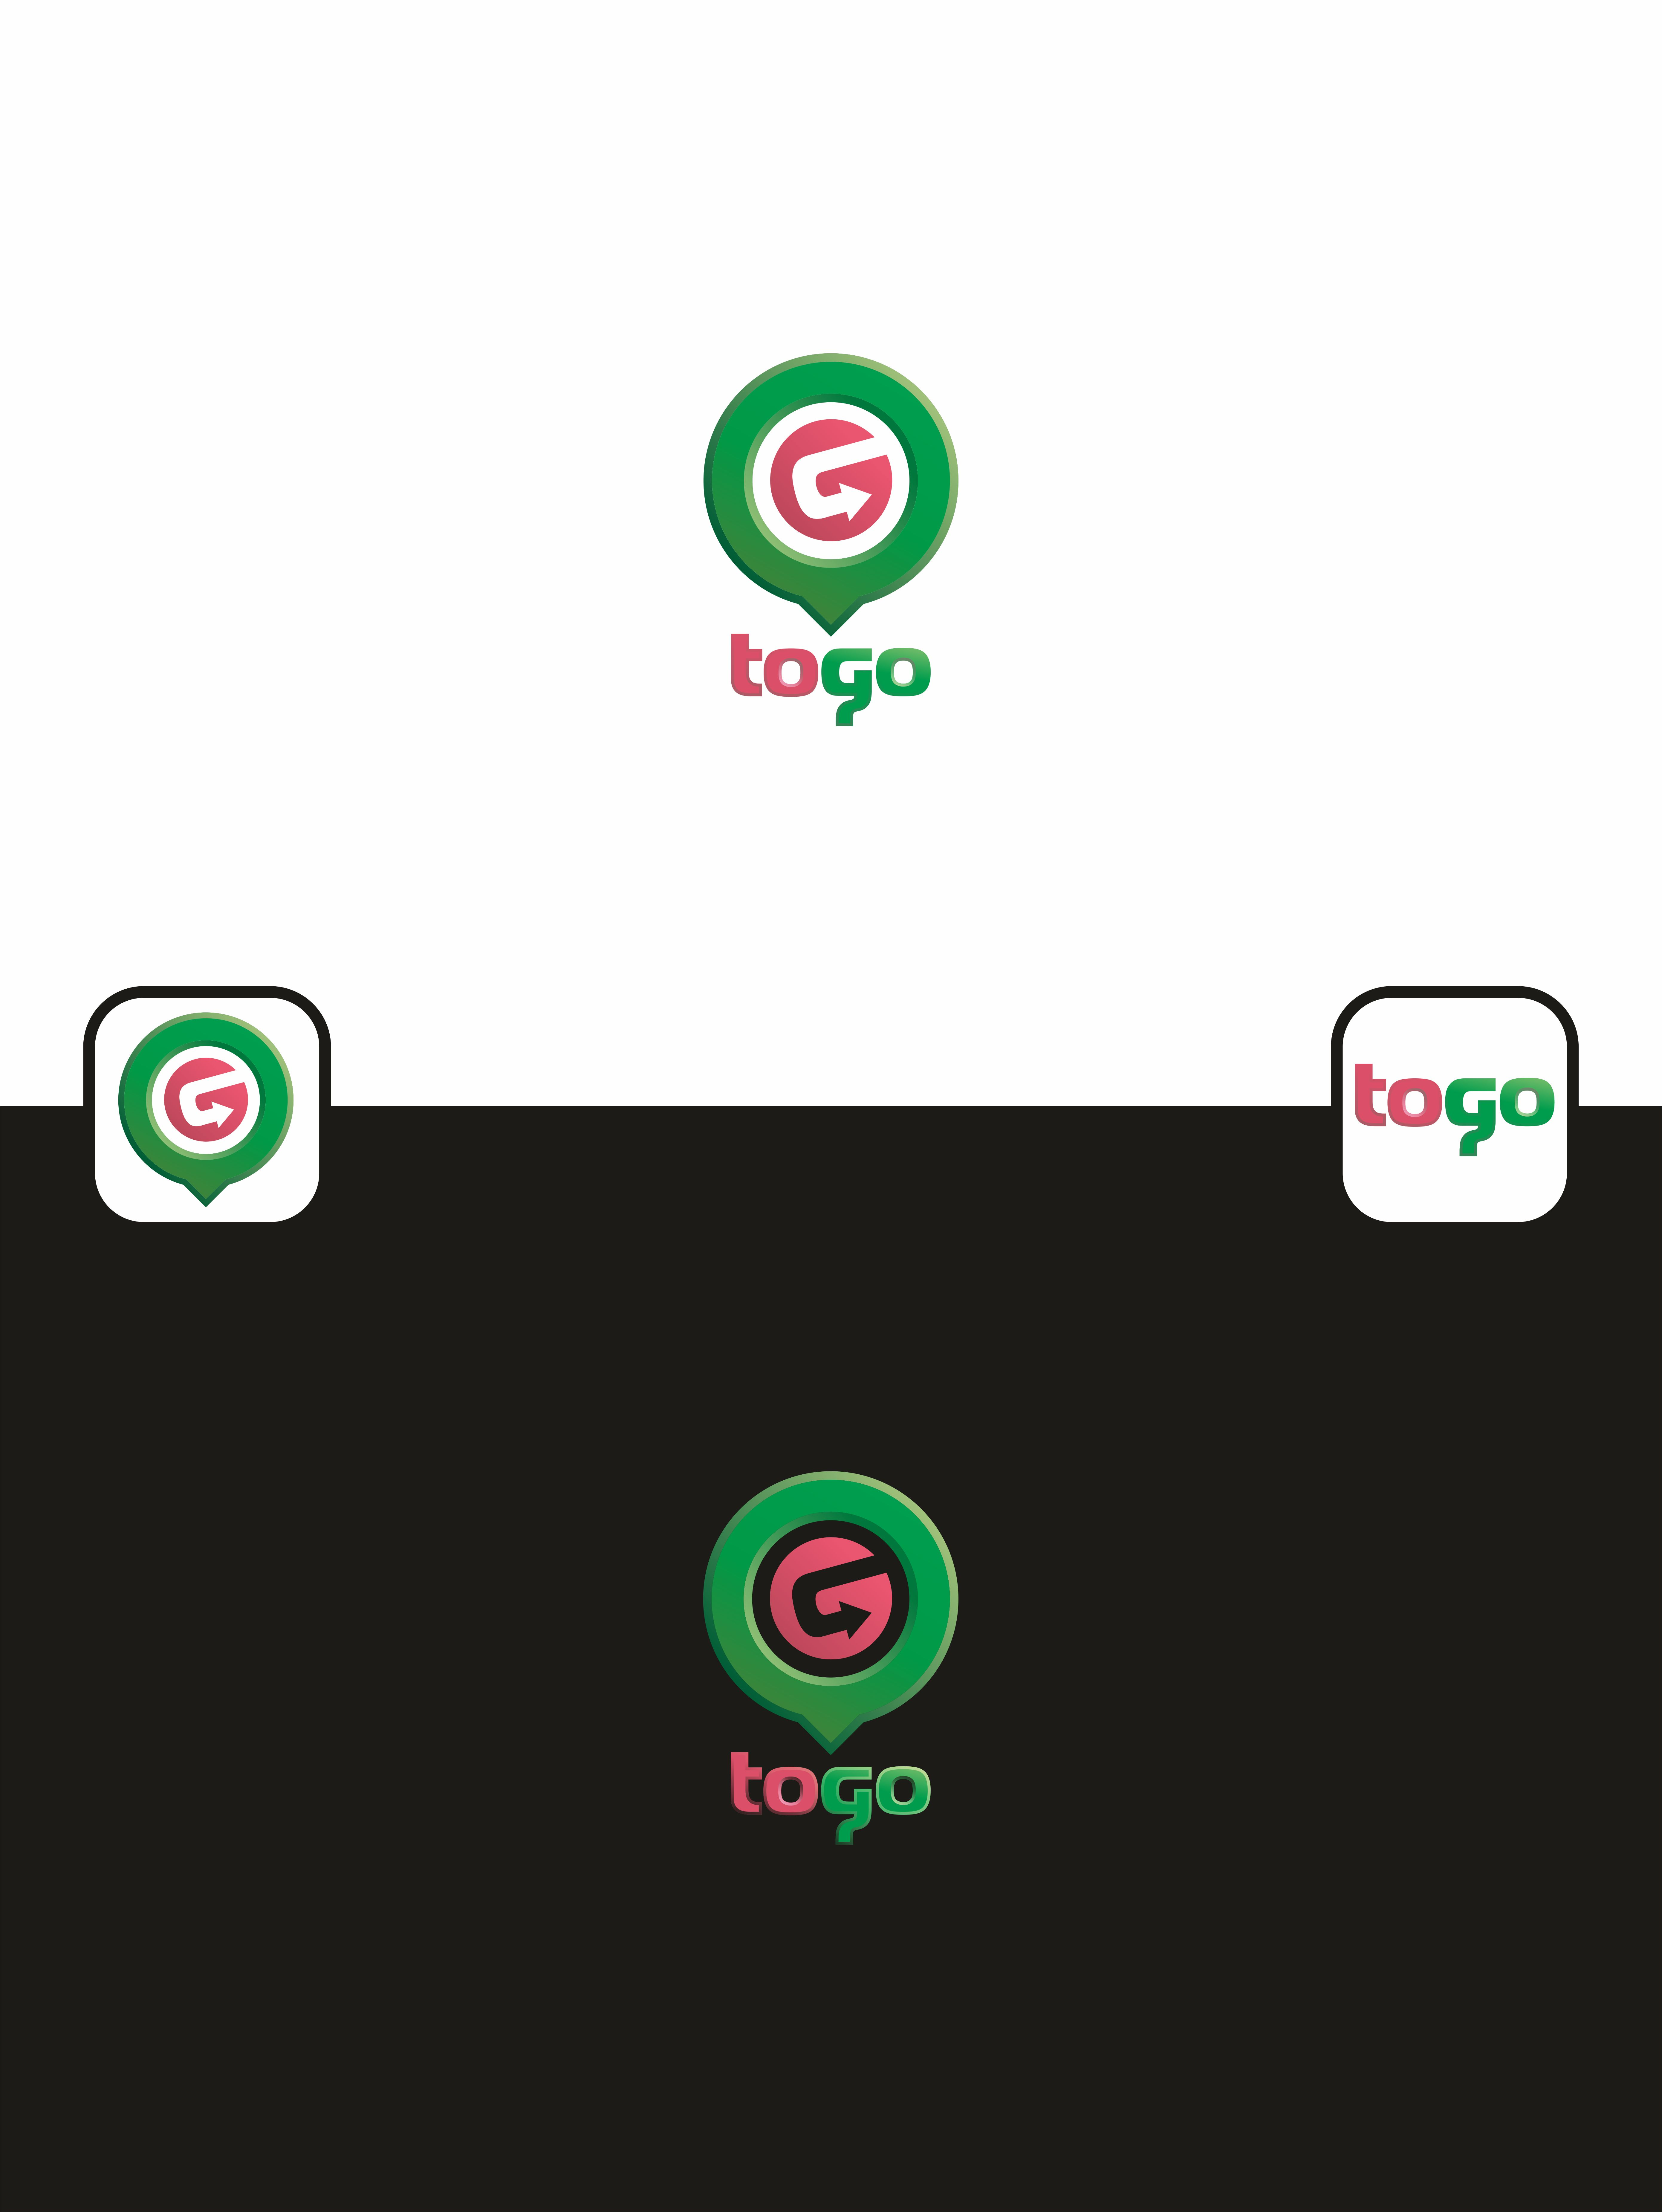 Разработать логотип и экран загрузки приложения фото f_8945a86d9c9e6591.jpg